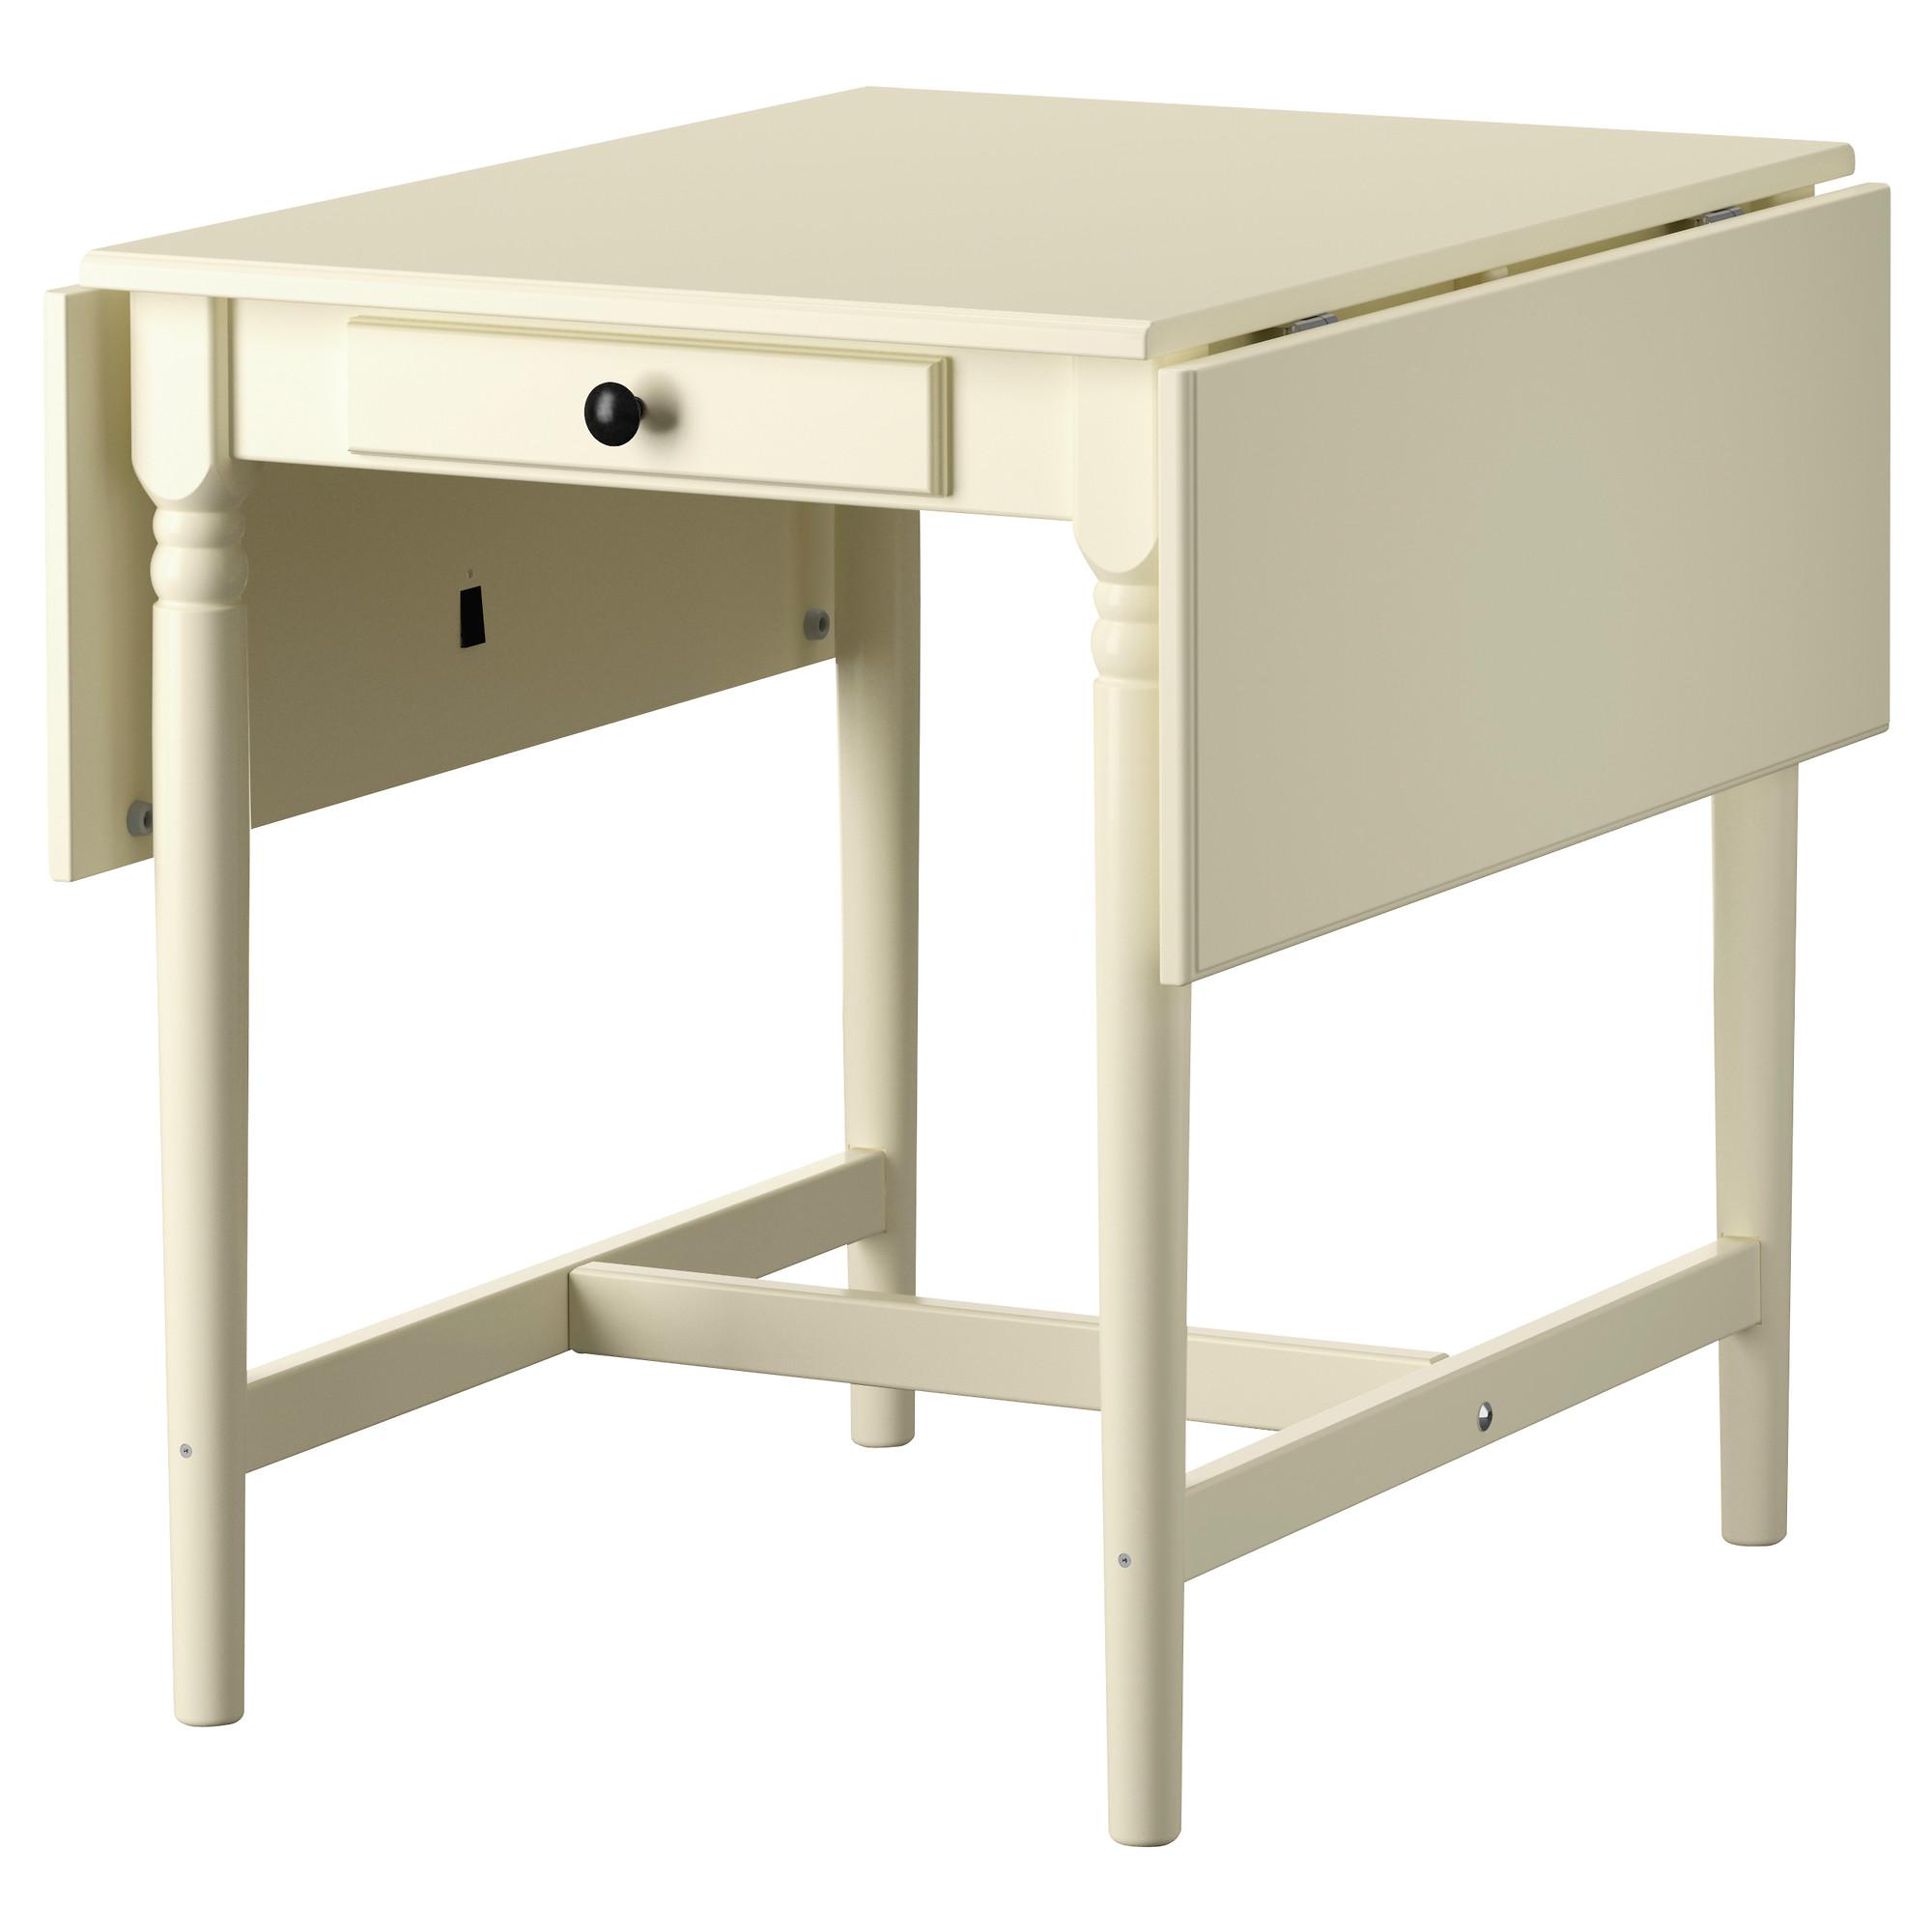 Размеры стола стол ИКЕА